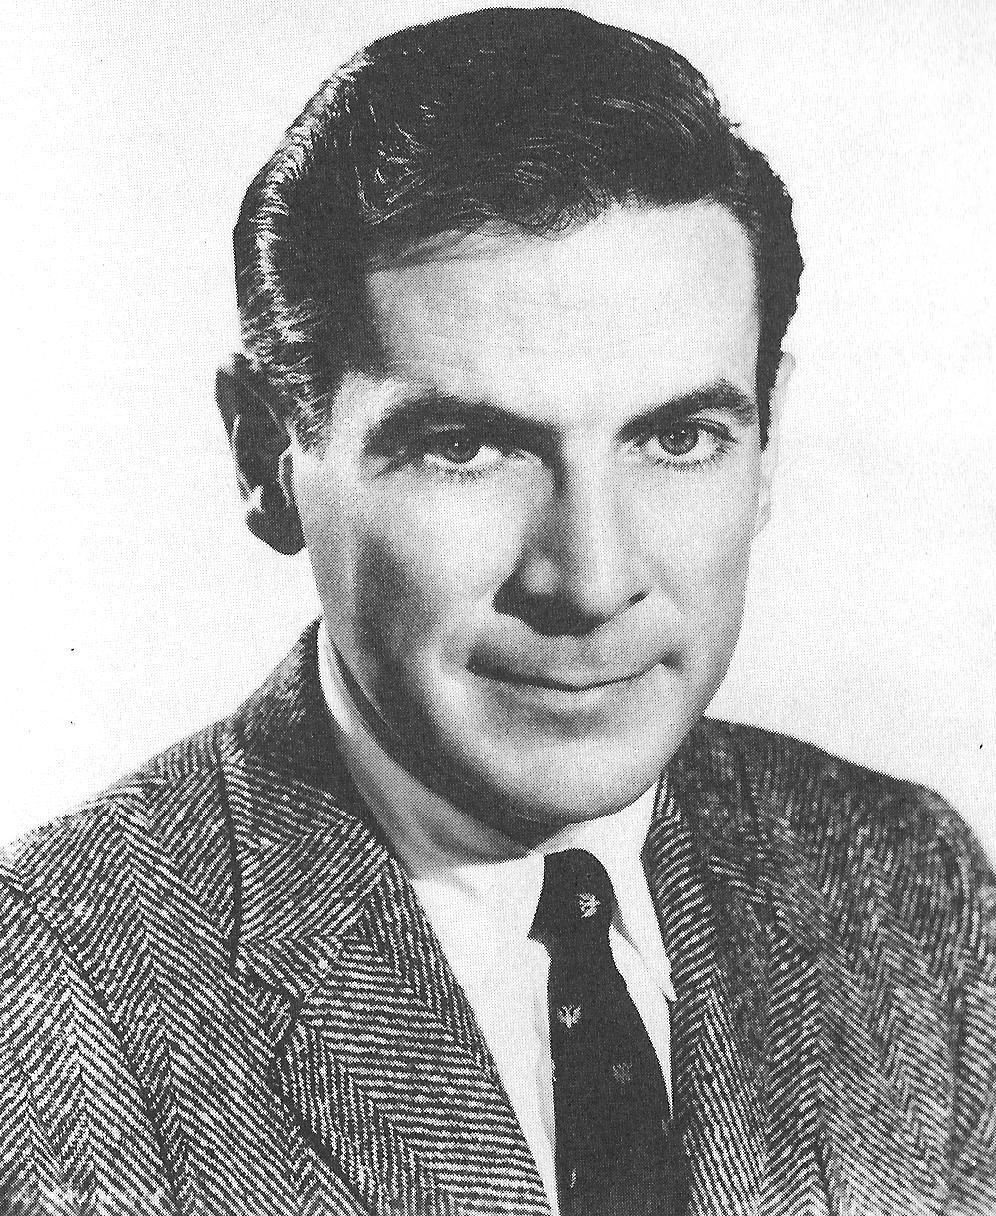 Norman Maurer